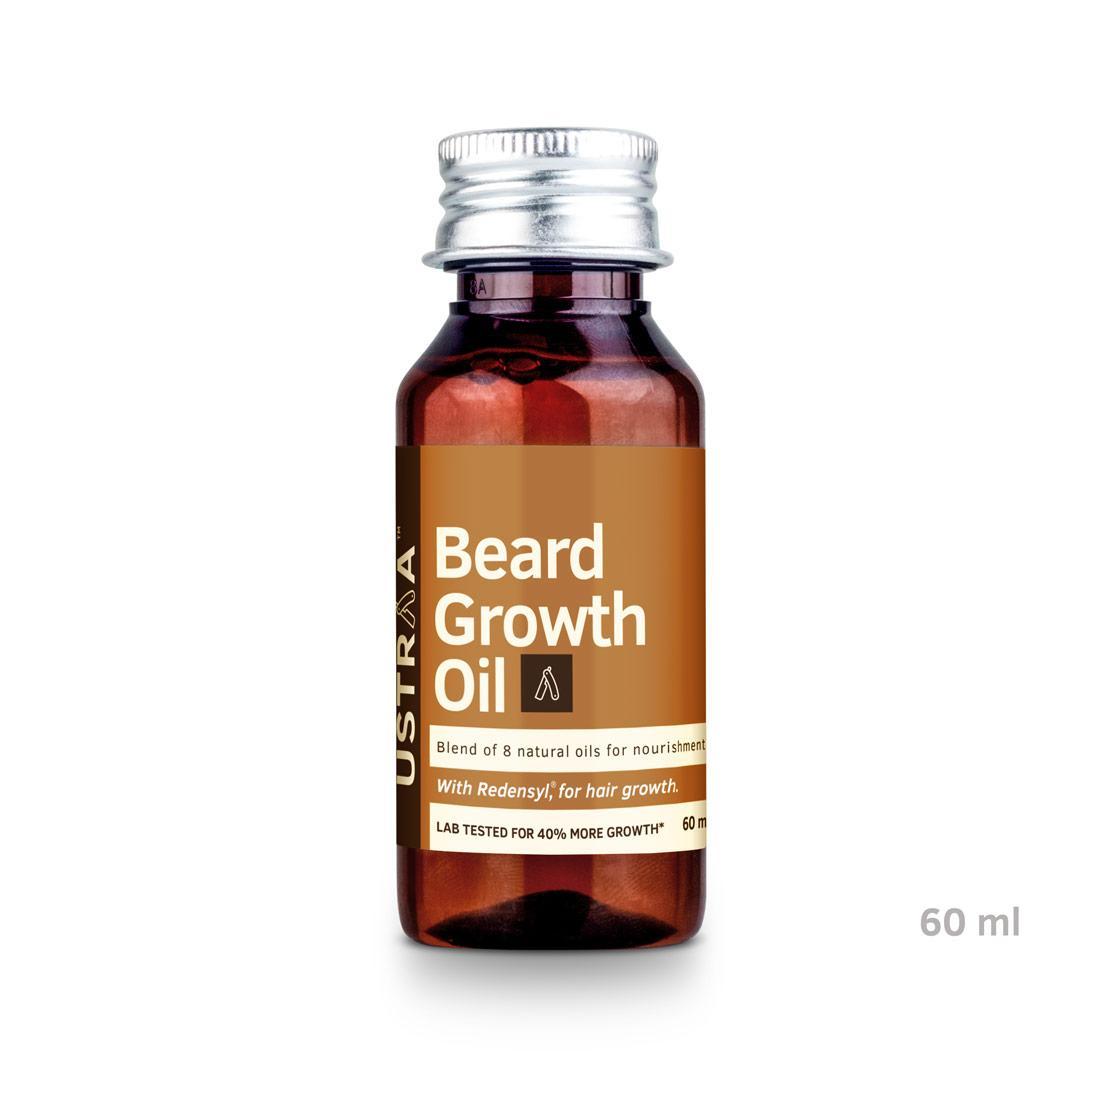 Ustraa Beard Growth Oil, Beard Oil for more Beard Growth with Redensyl, 8 Natural Oils including Jojoba Oil & Vitamin E, 60 ml